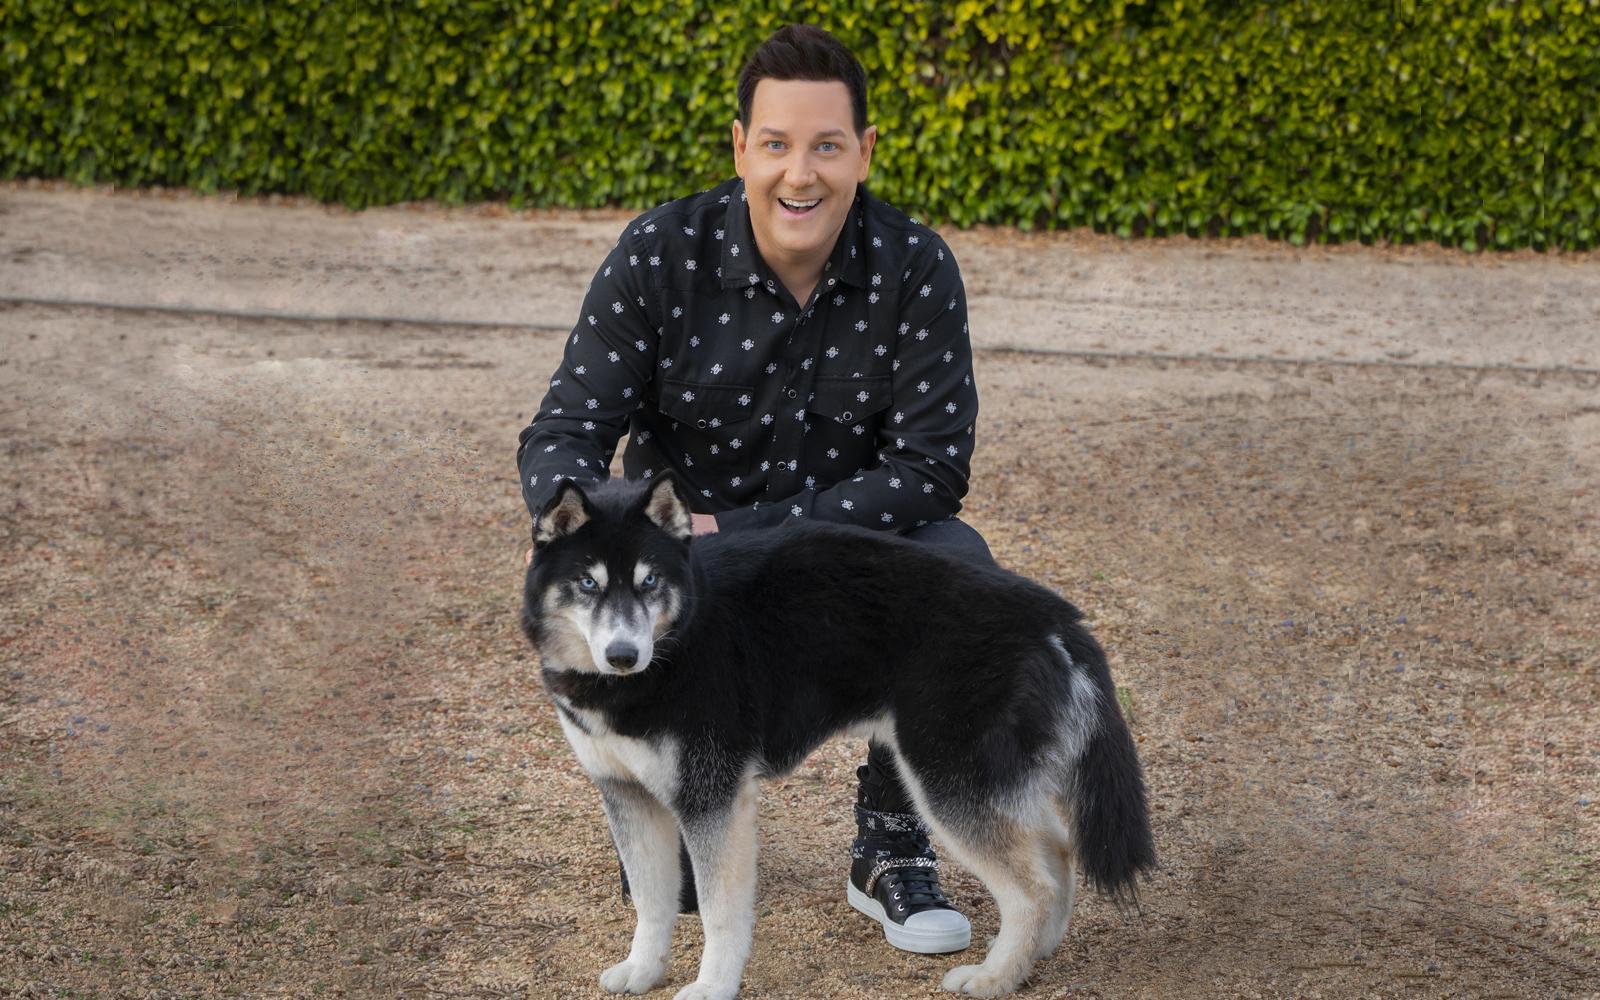 Magician Steve Wyrick and new husky dog.